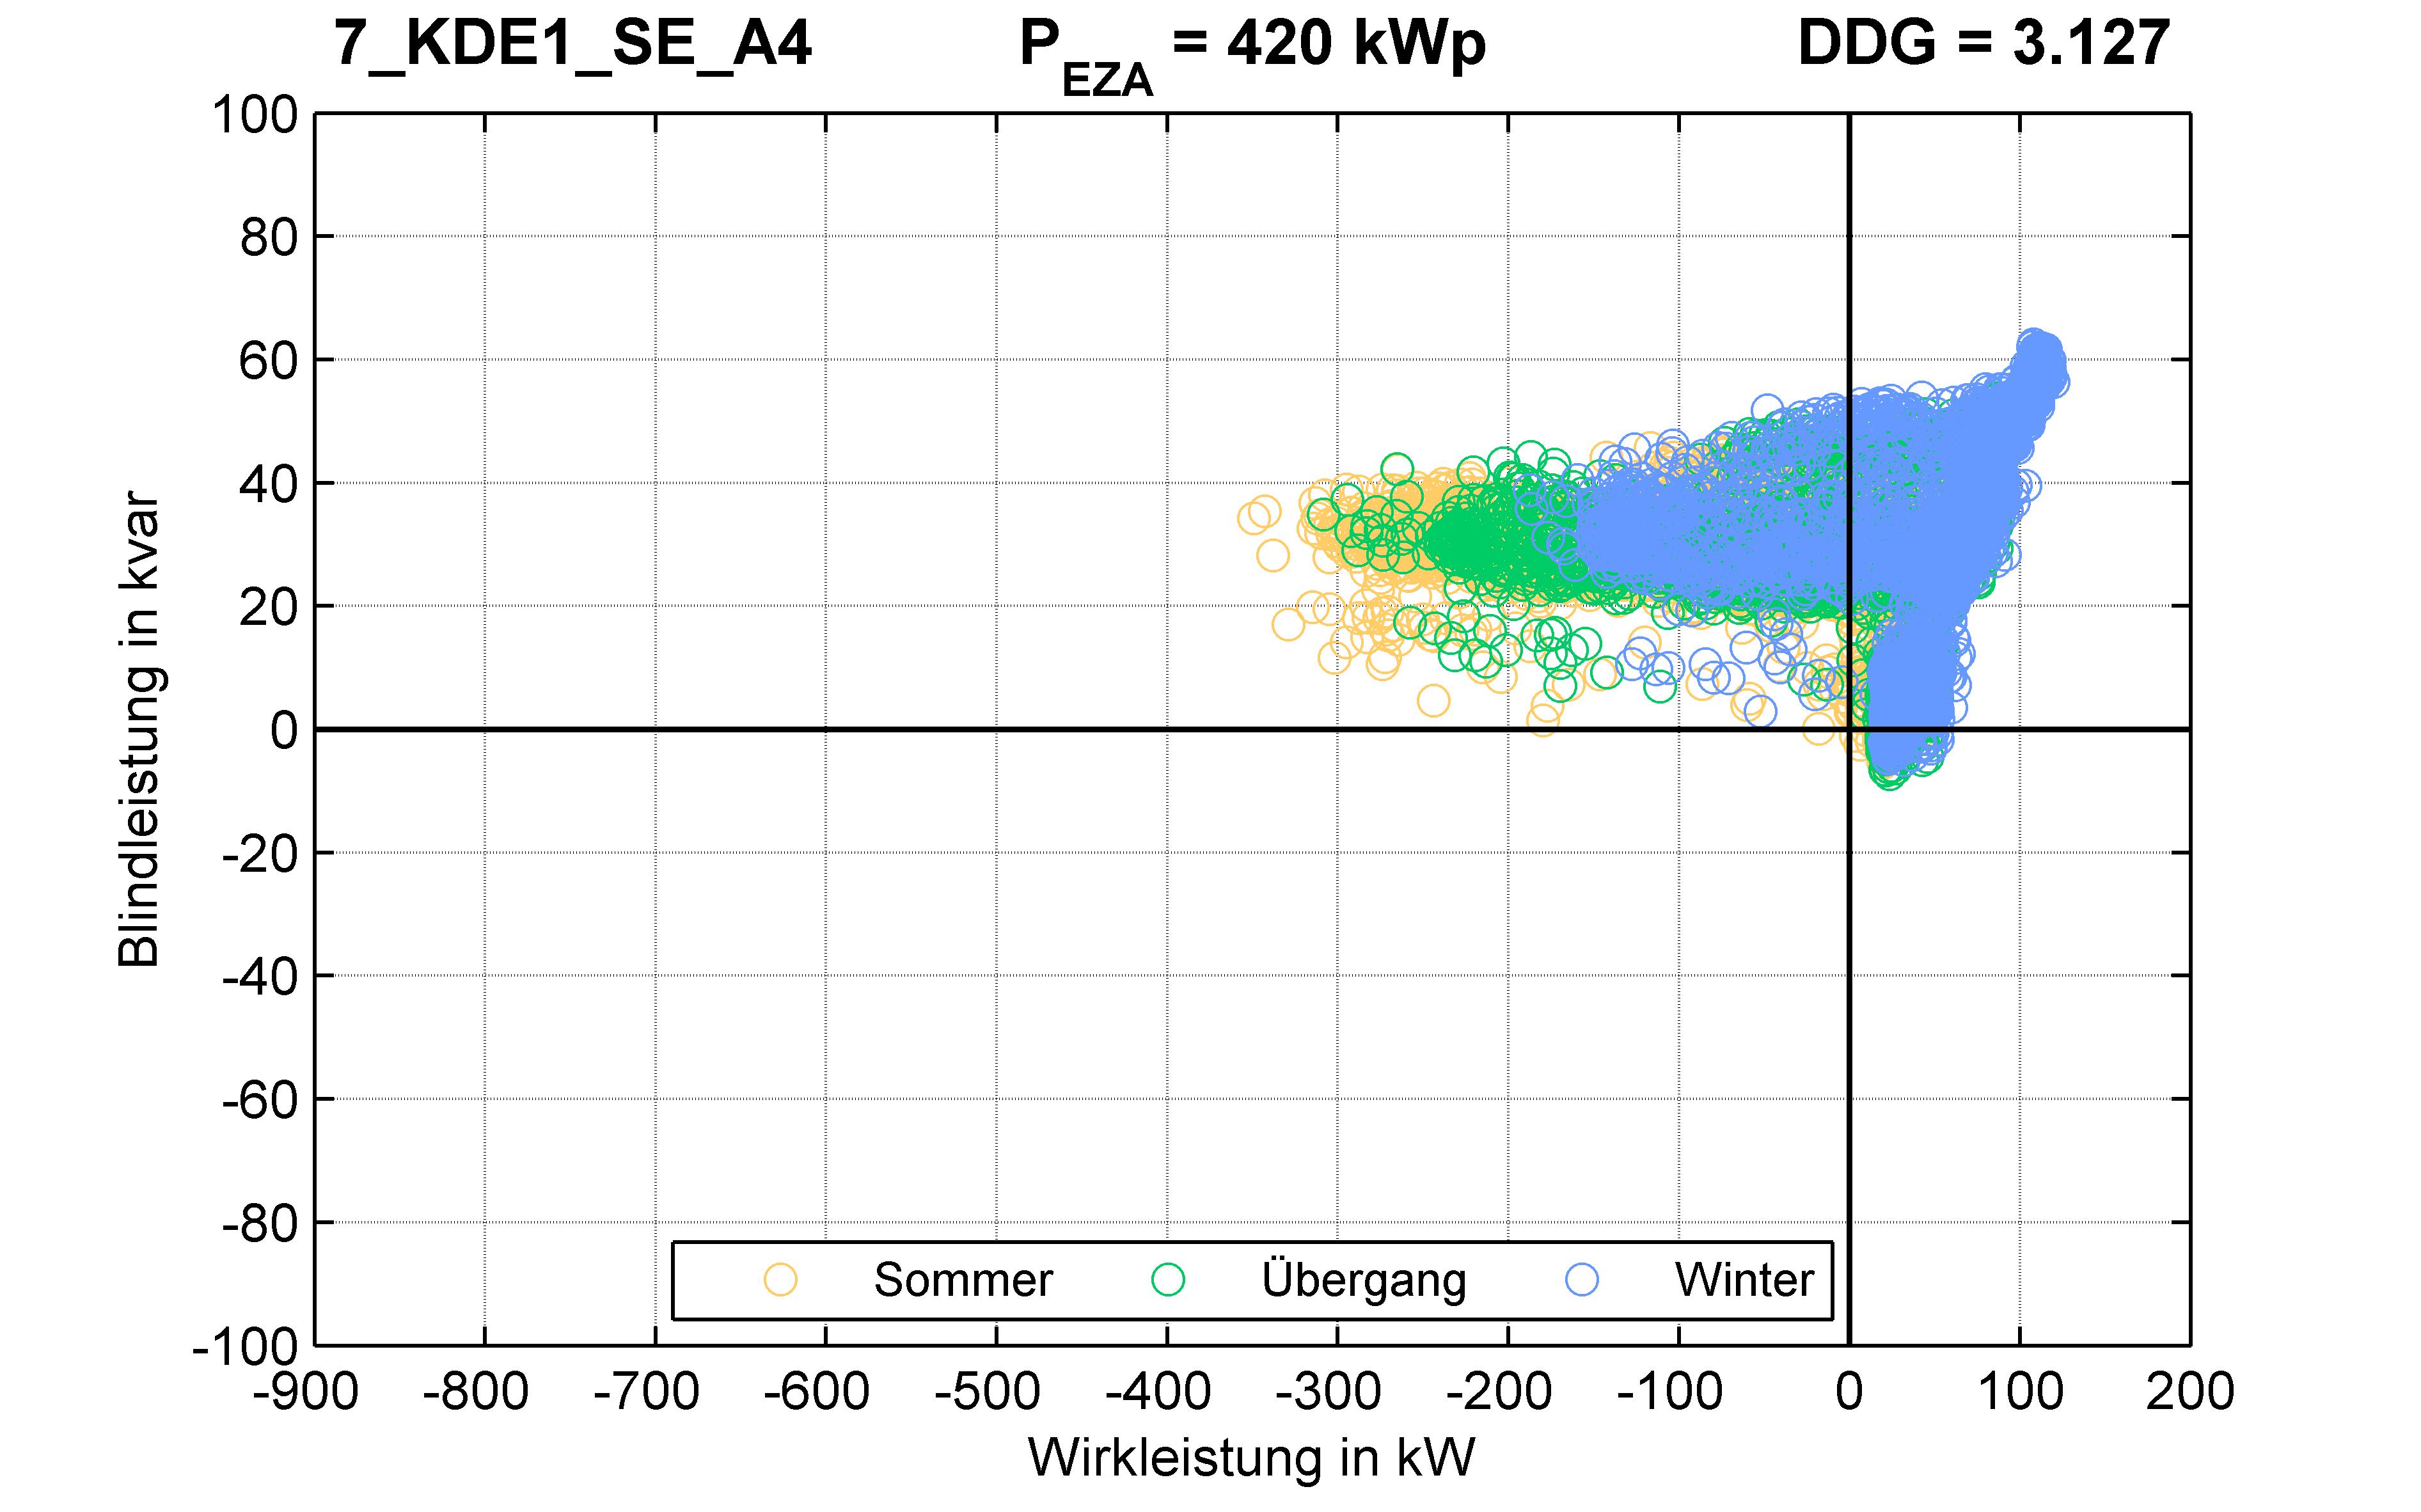 KDE1 | Längsregler (SE) A4 | PQ-Verhalten